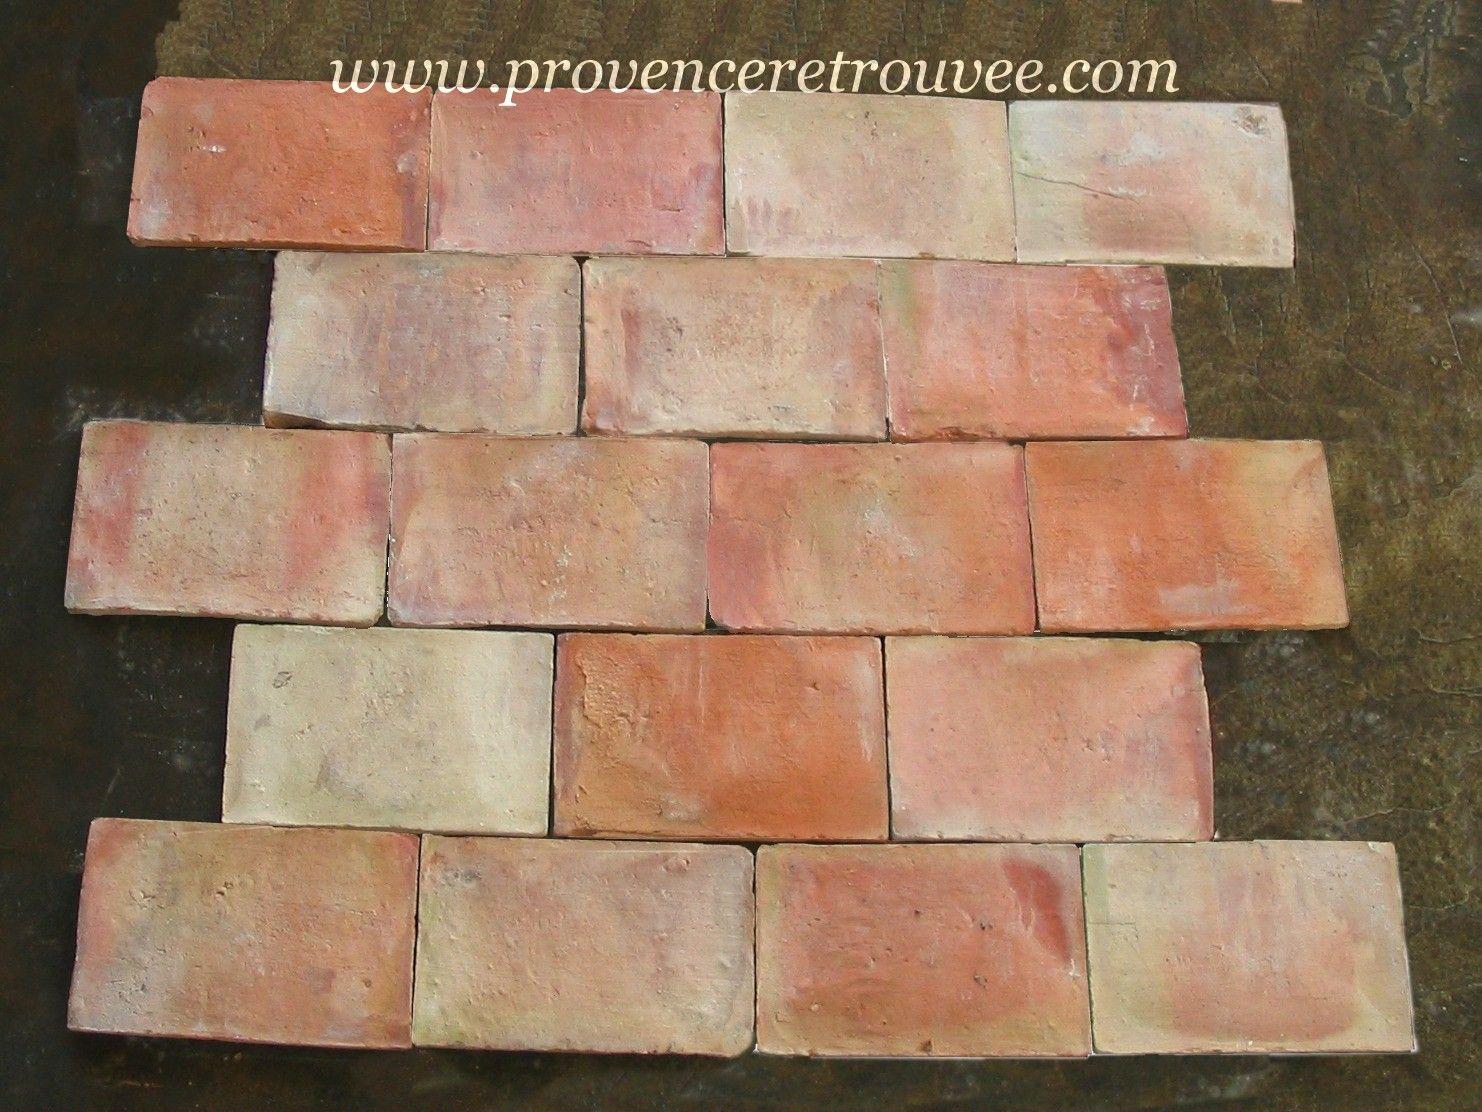 Antique Parefeuille 6 X 9 Terra Cotta Stone Crafts Painting Tile Antiques